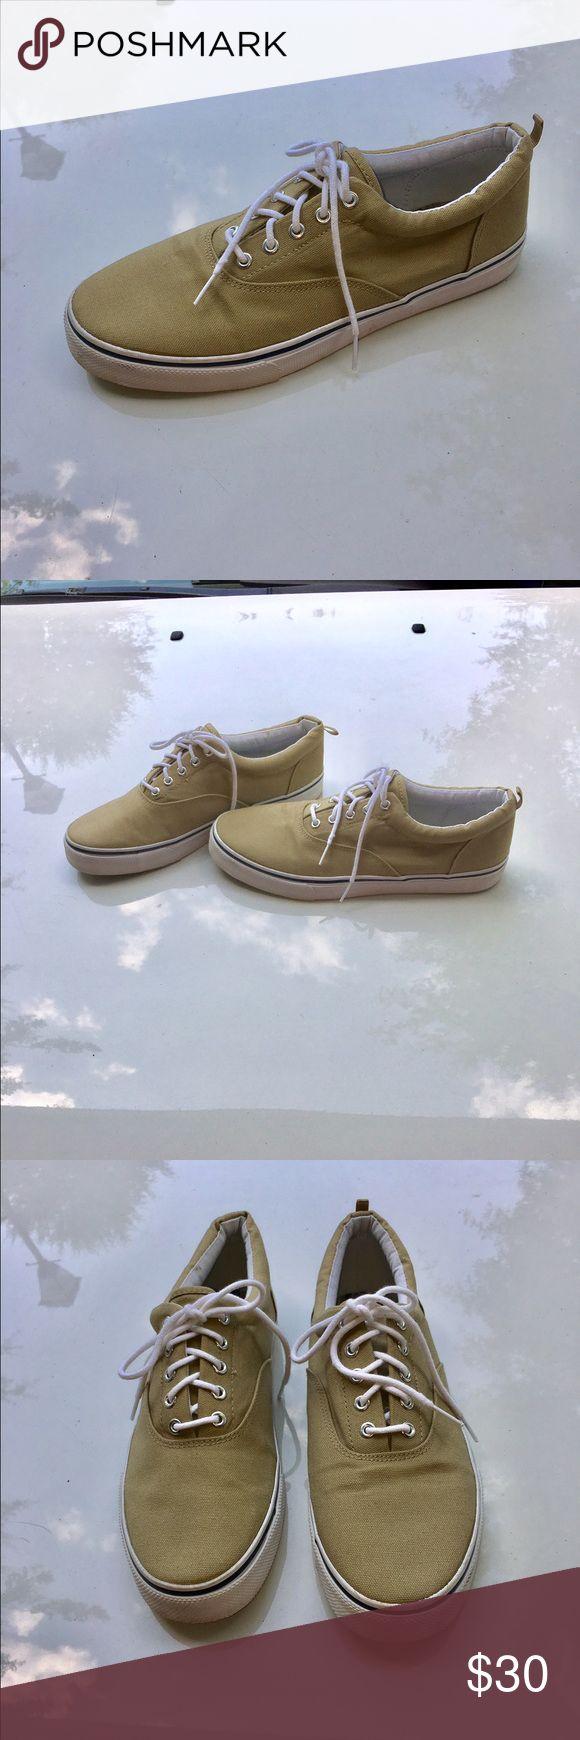 OP BOAT SHOES OP BEIGE BOAT SHOES WORN COUPLE TIMES... MEN SIZE 11 Shoes Boat Shoes